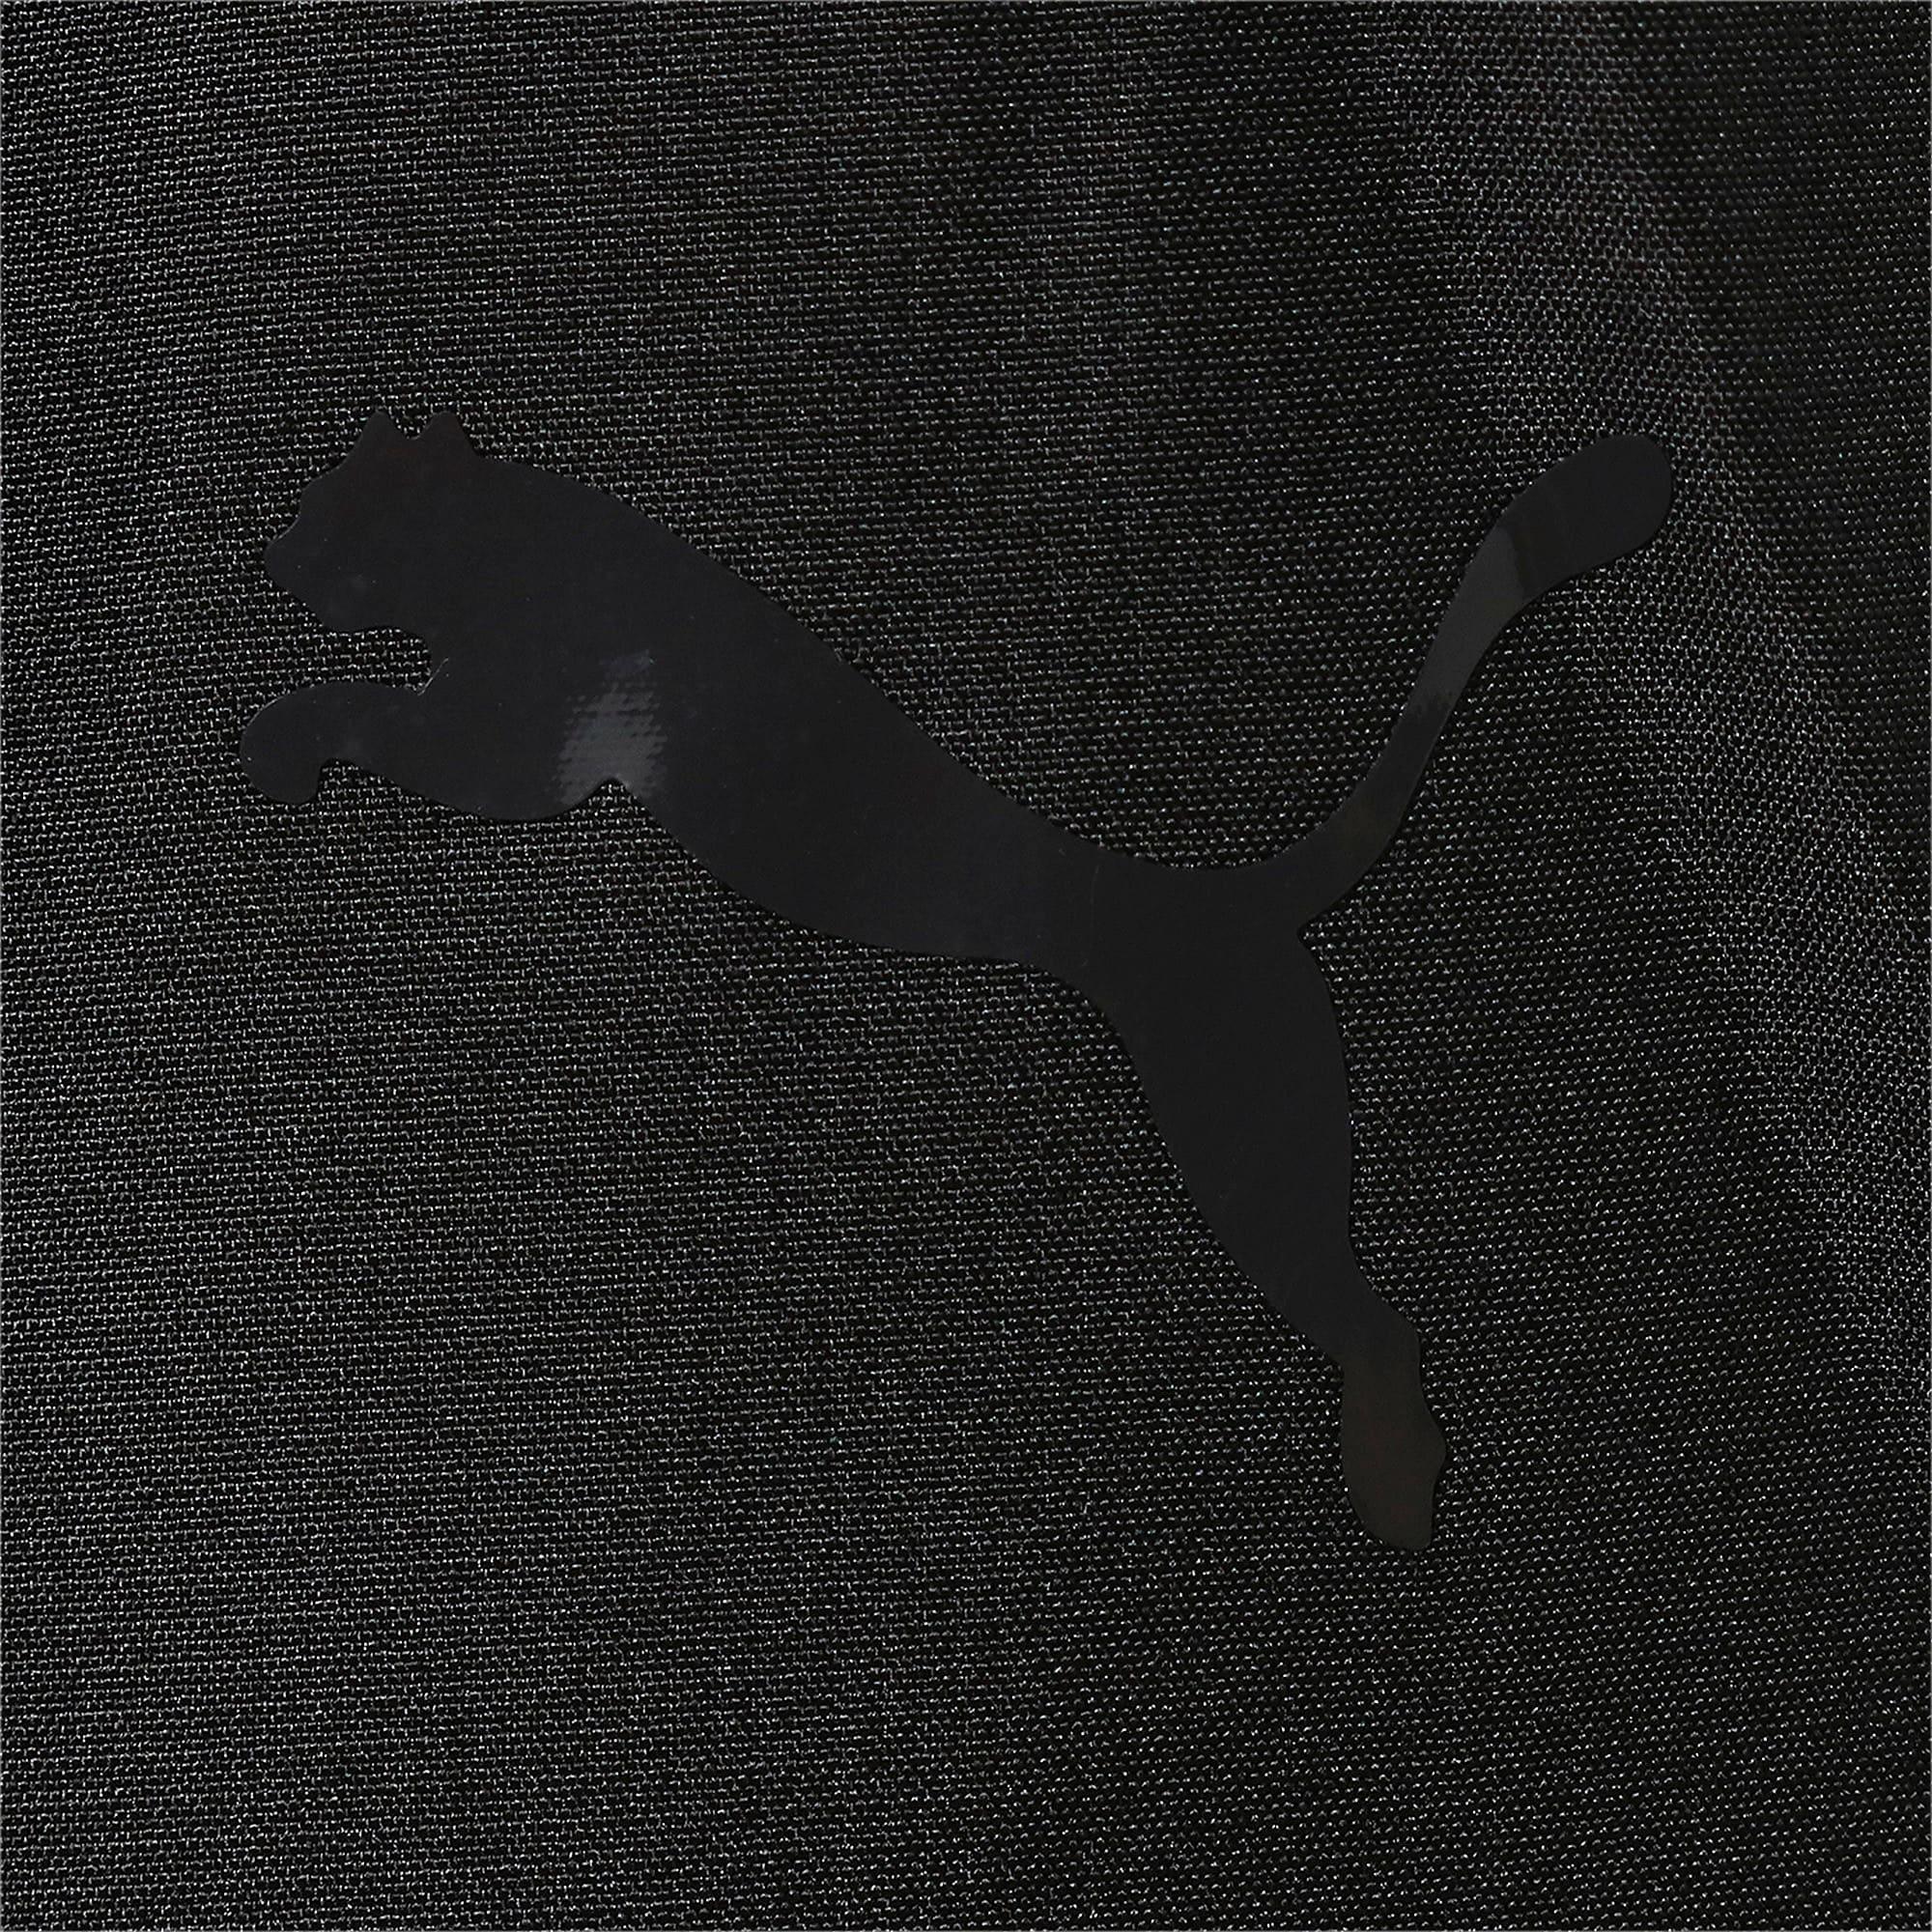 Thumbnail 7 of FAVORITE メッシュライニング ウィメンズ トレーニング ウーブンパンツ, Puma Black, medium-JPN